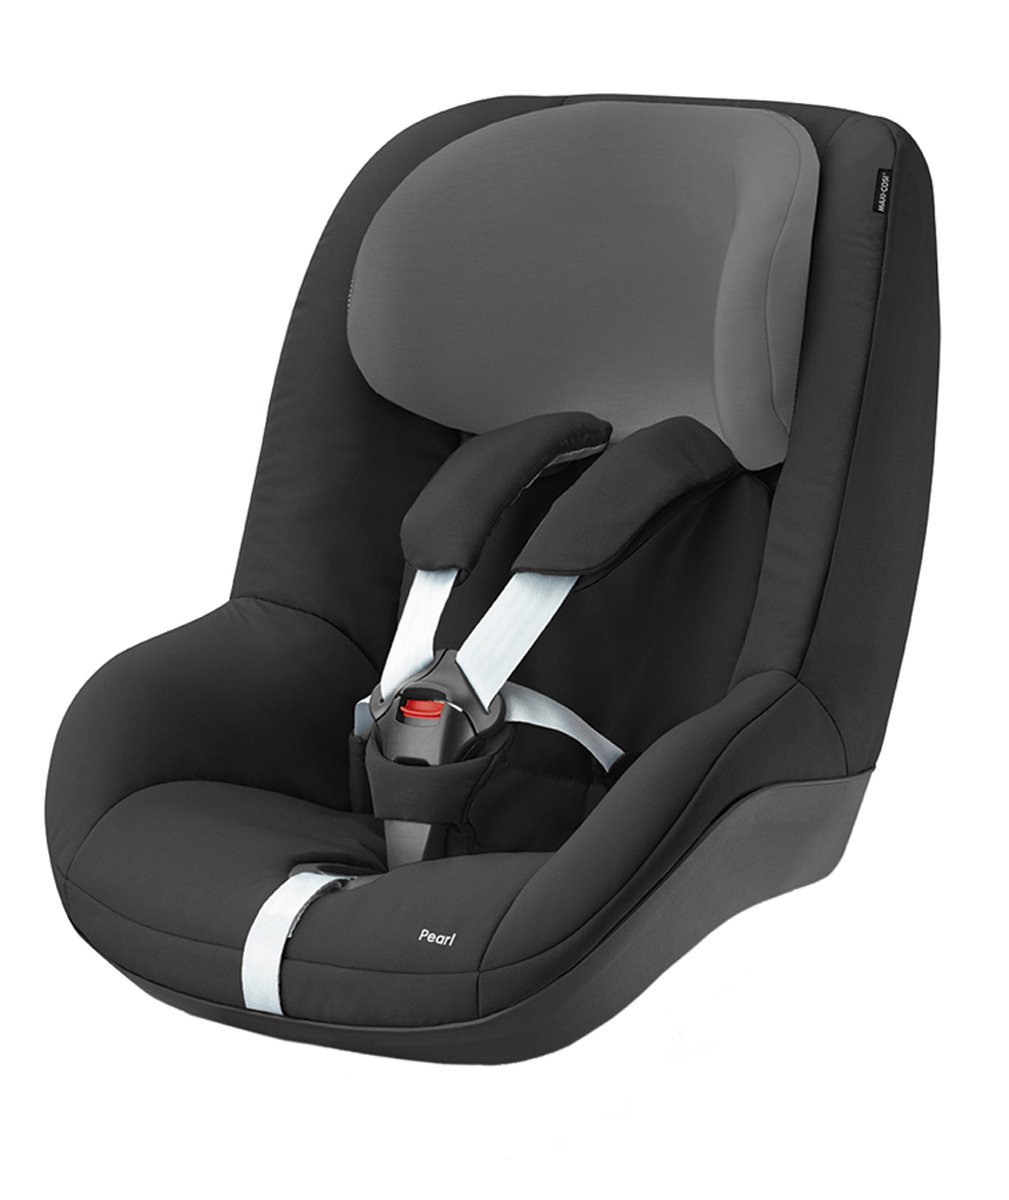 Maxi-Cosi 63409641Pearl Children's Seat, Group 1, 9-18kg Maxi-Cosi  1